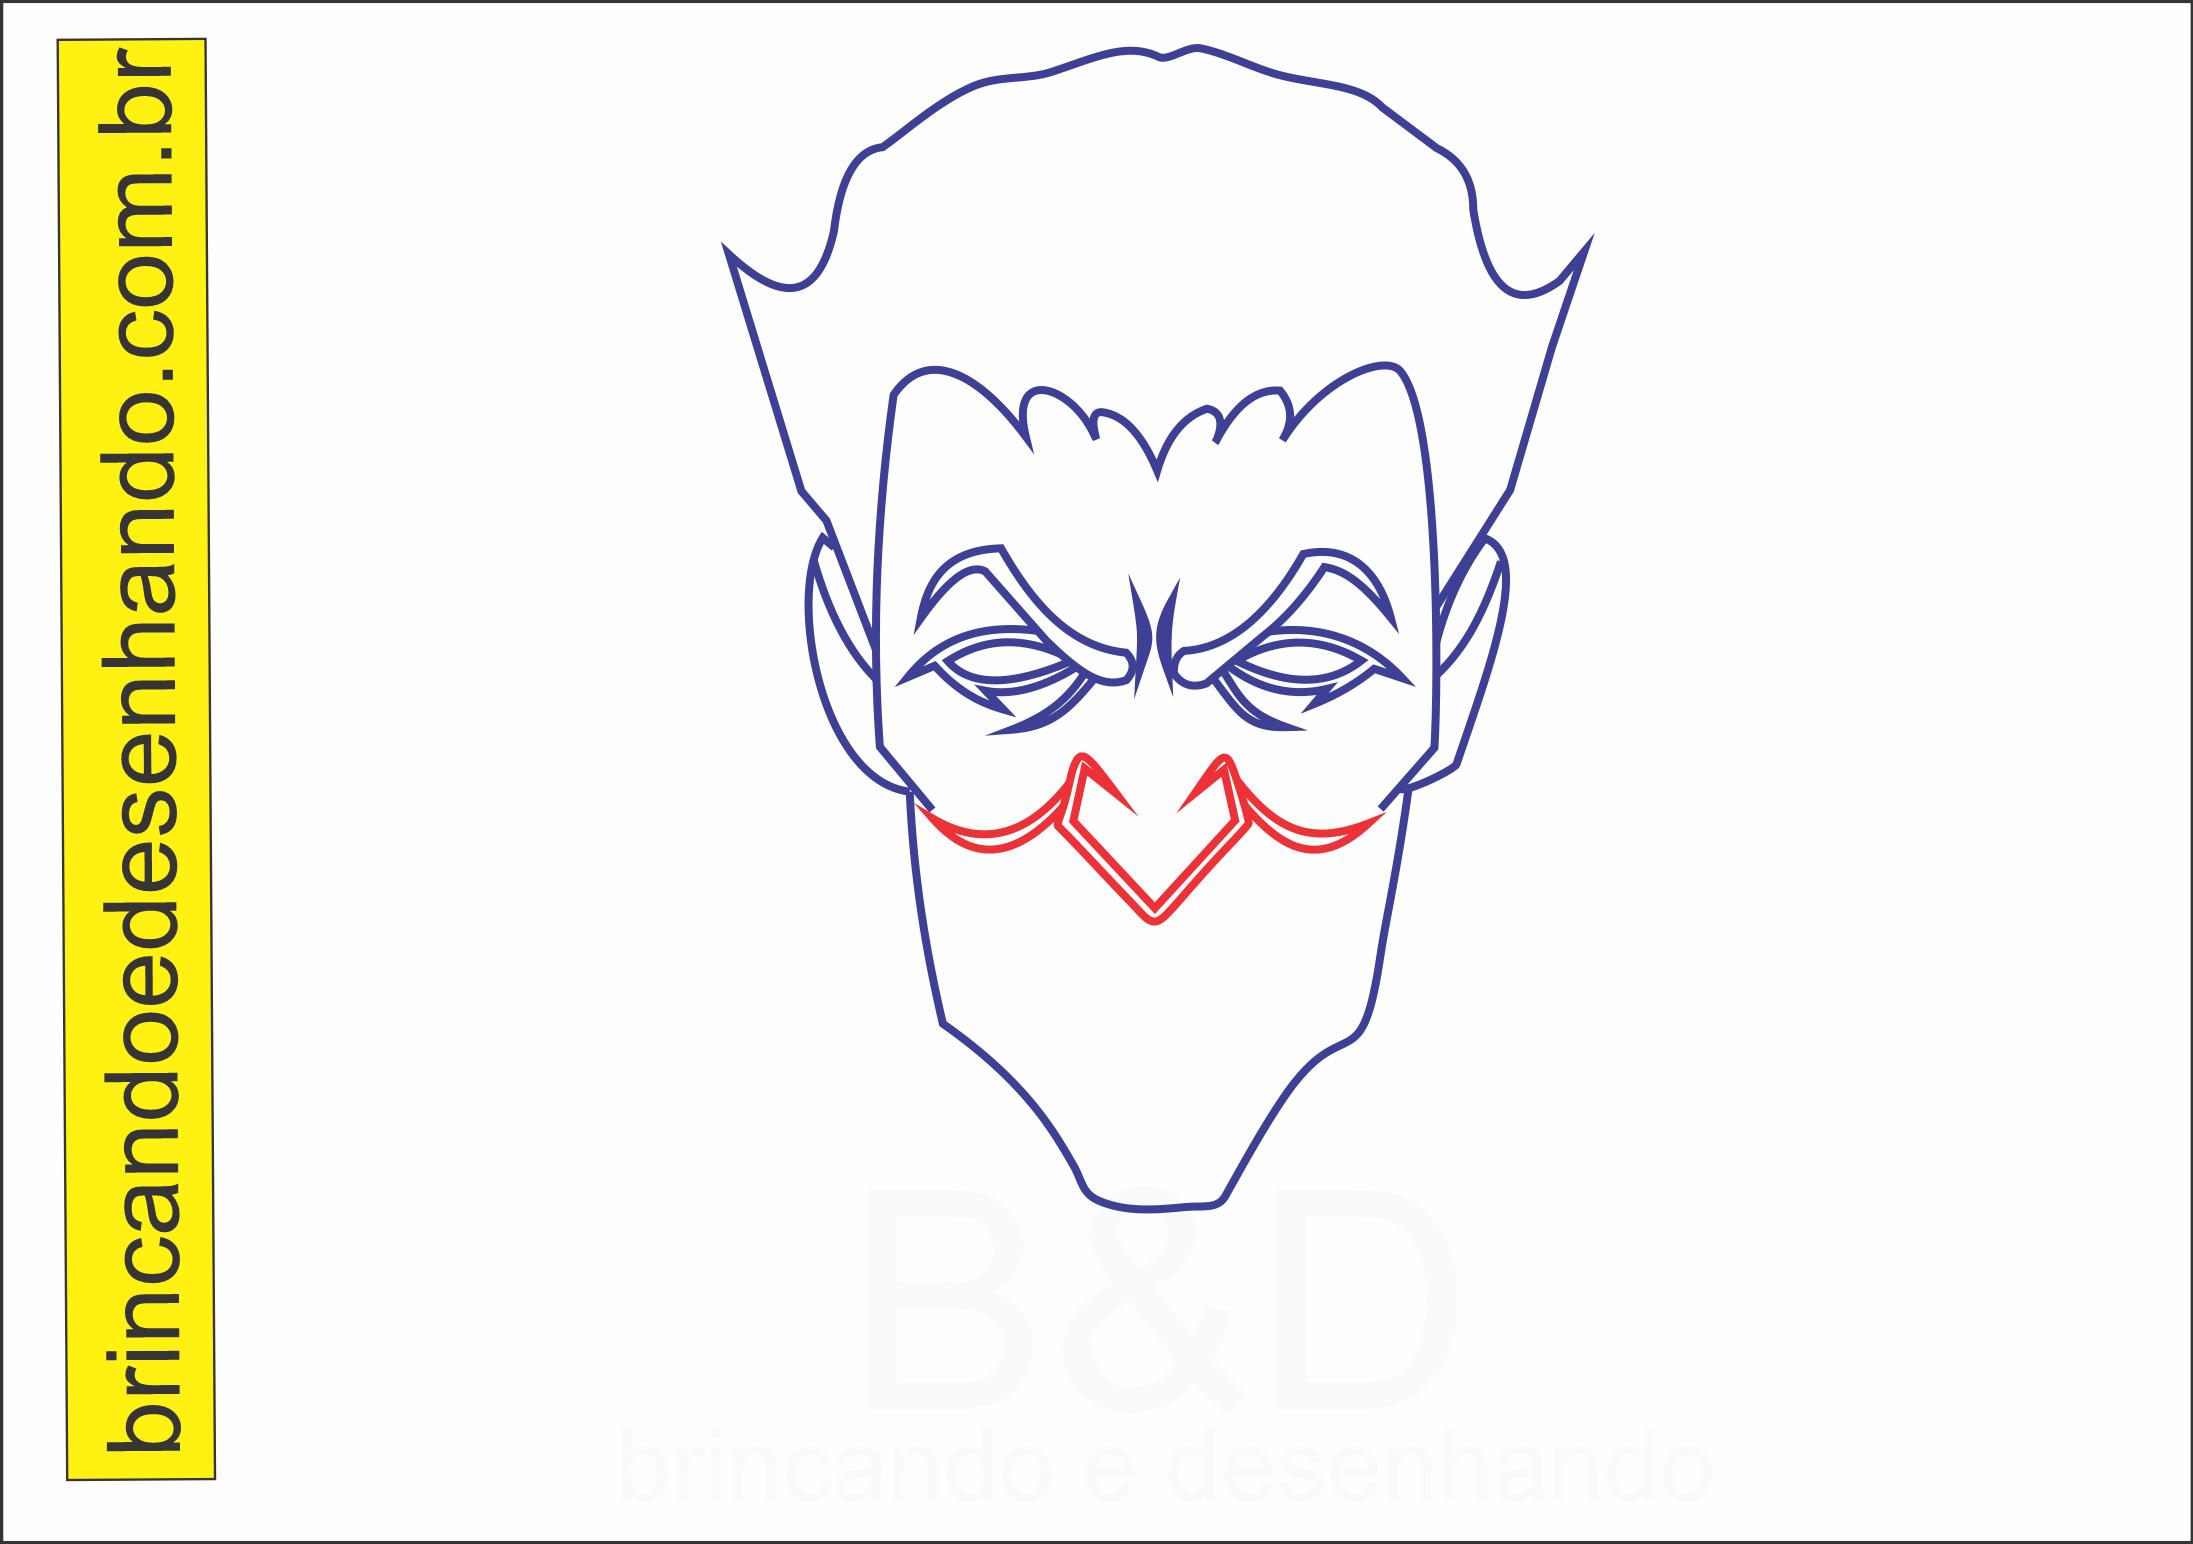 Como Desenhar O Joker Coringa Do Batman Brincando E Desenhando